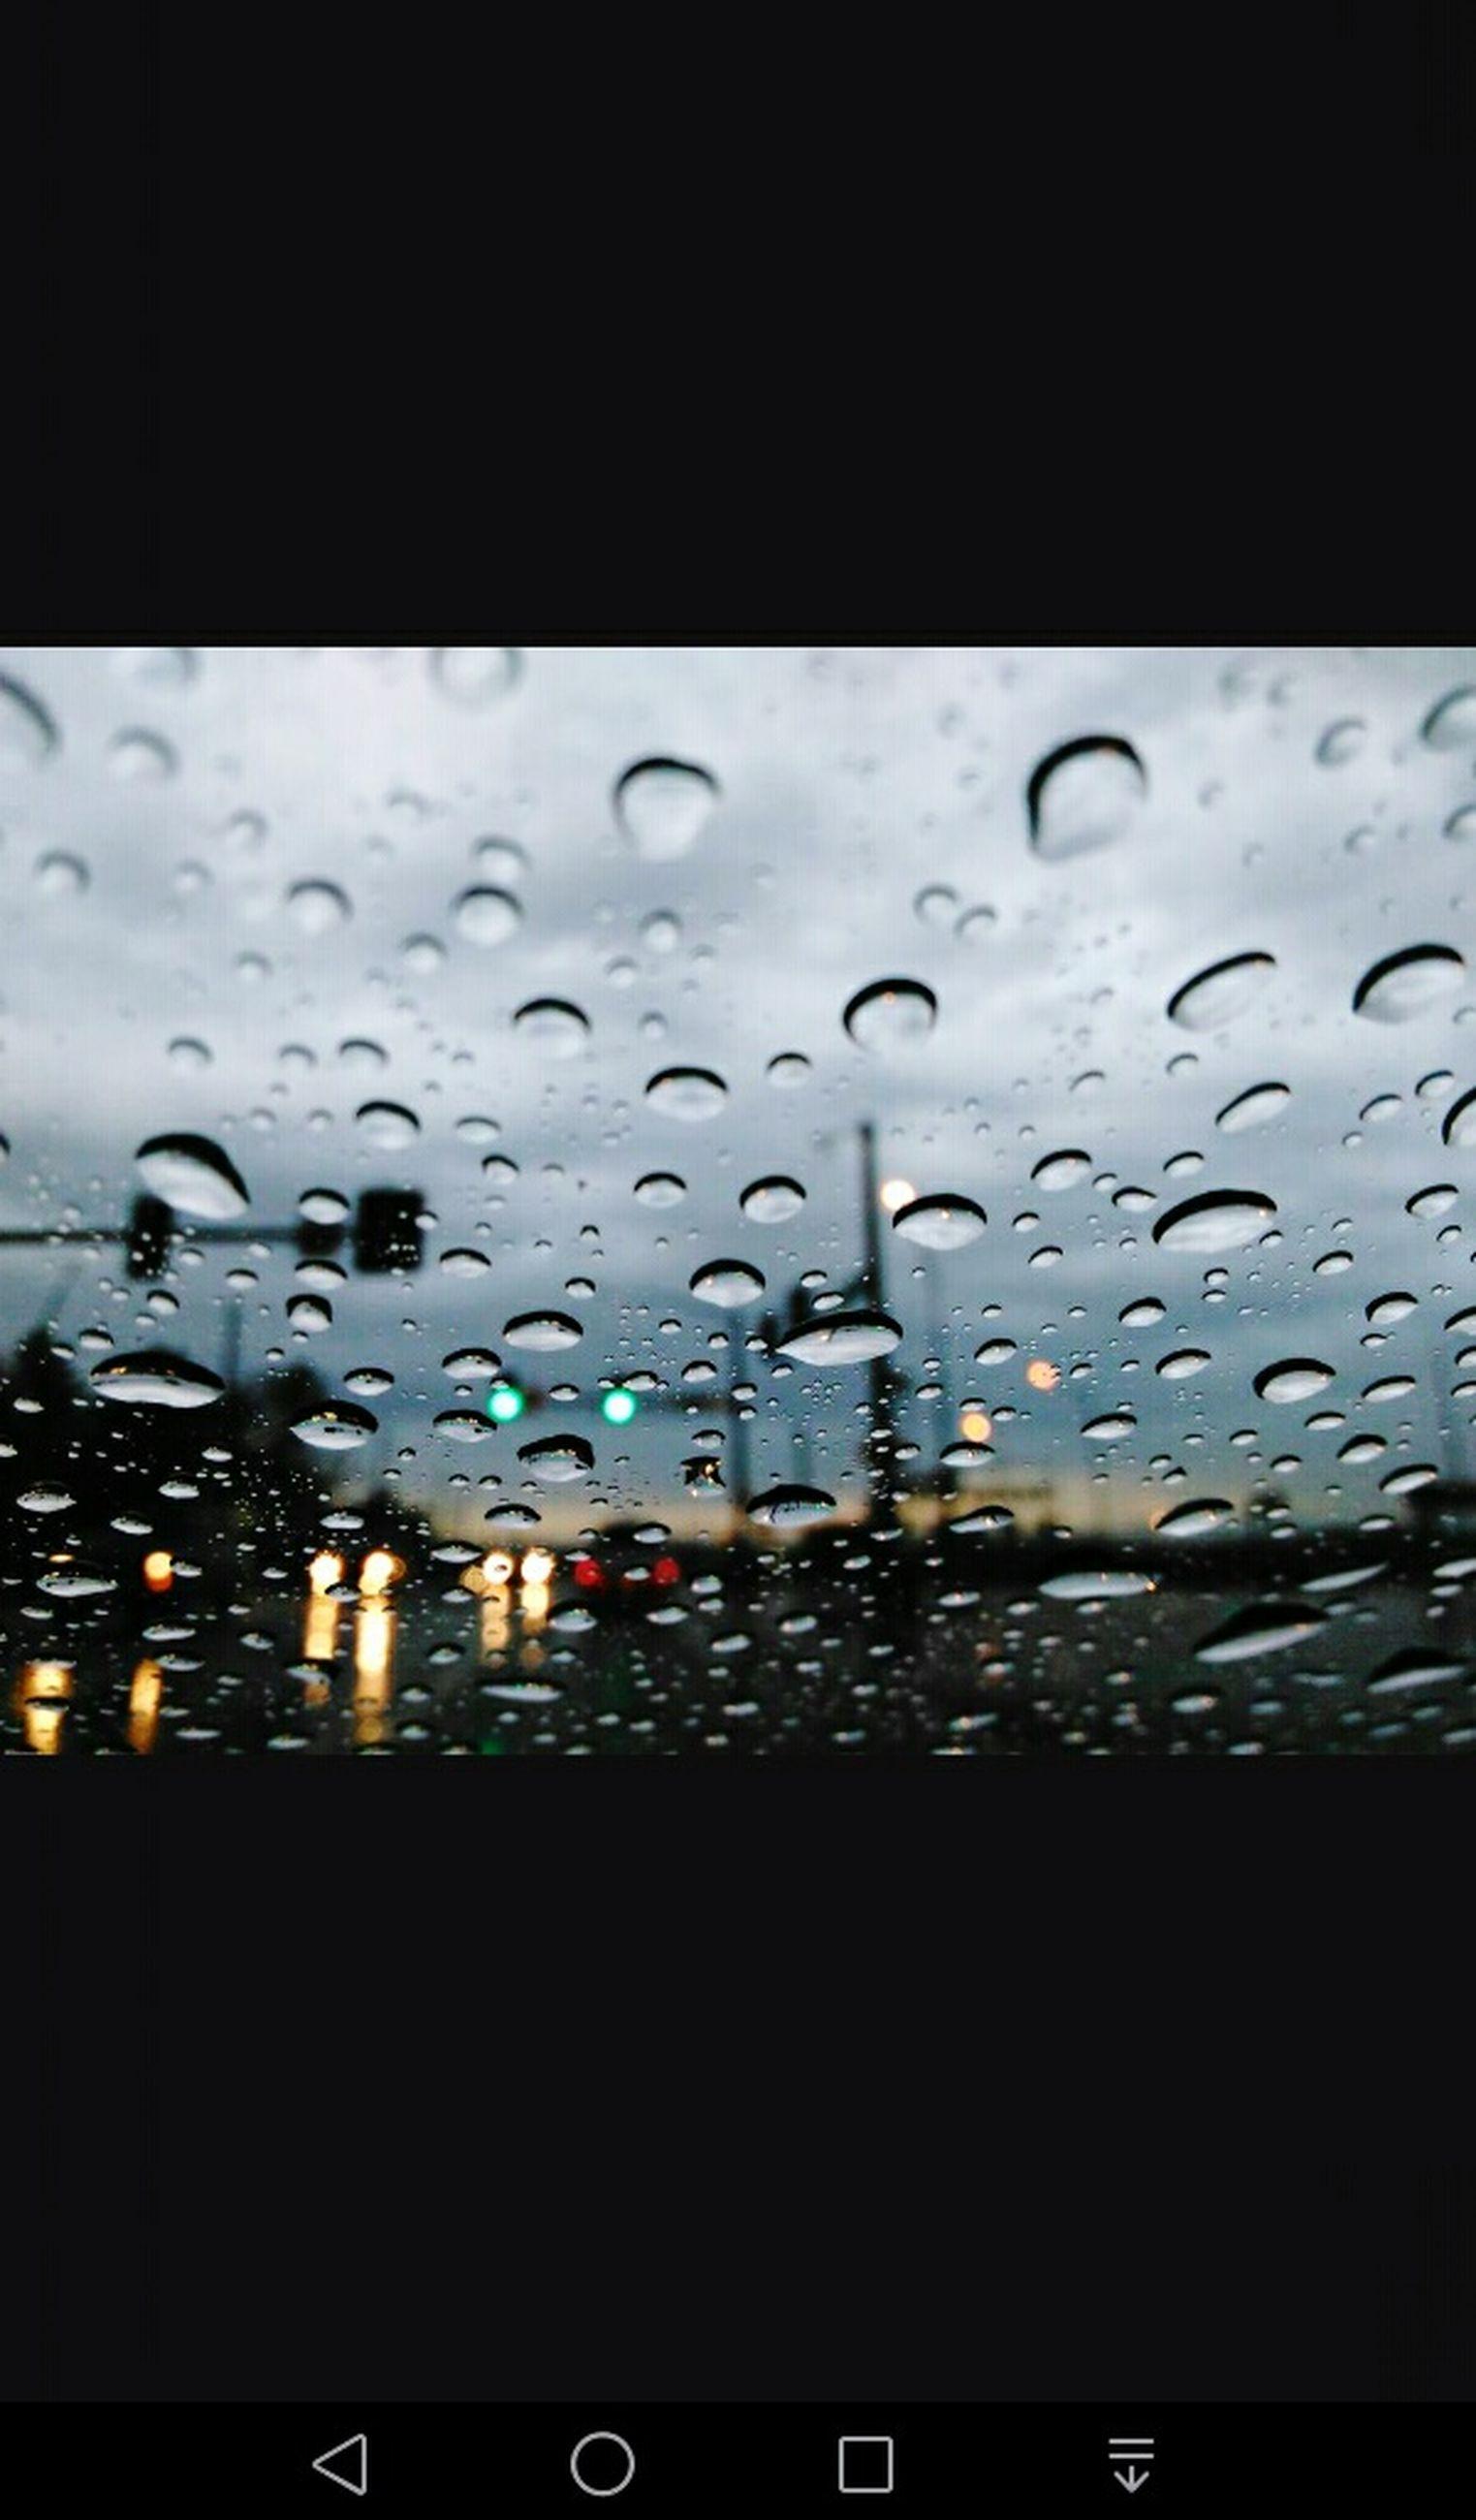 drop, rain, water, window, wet, no people, weather, rainy season, raindrop, sky, transportation, mode of transport, close-up, backgrounds, nature, indoors, day